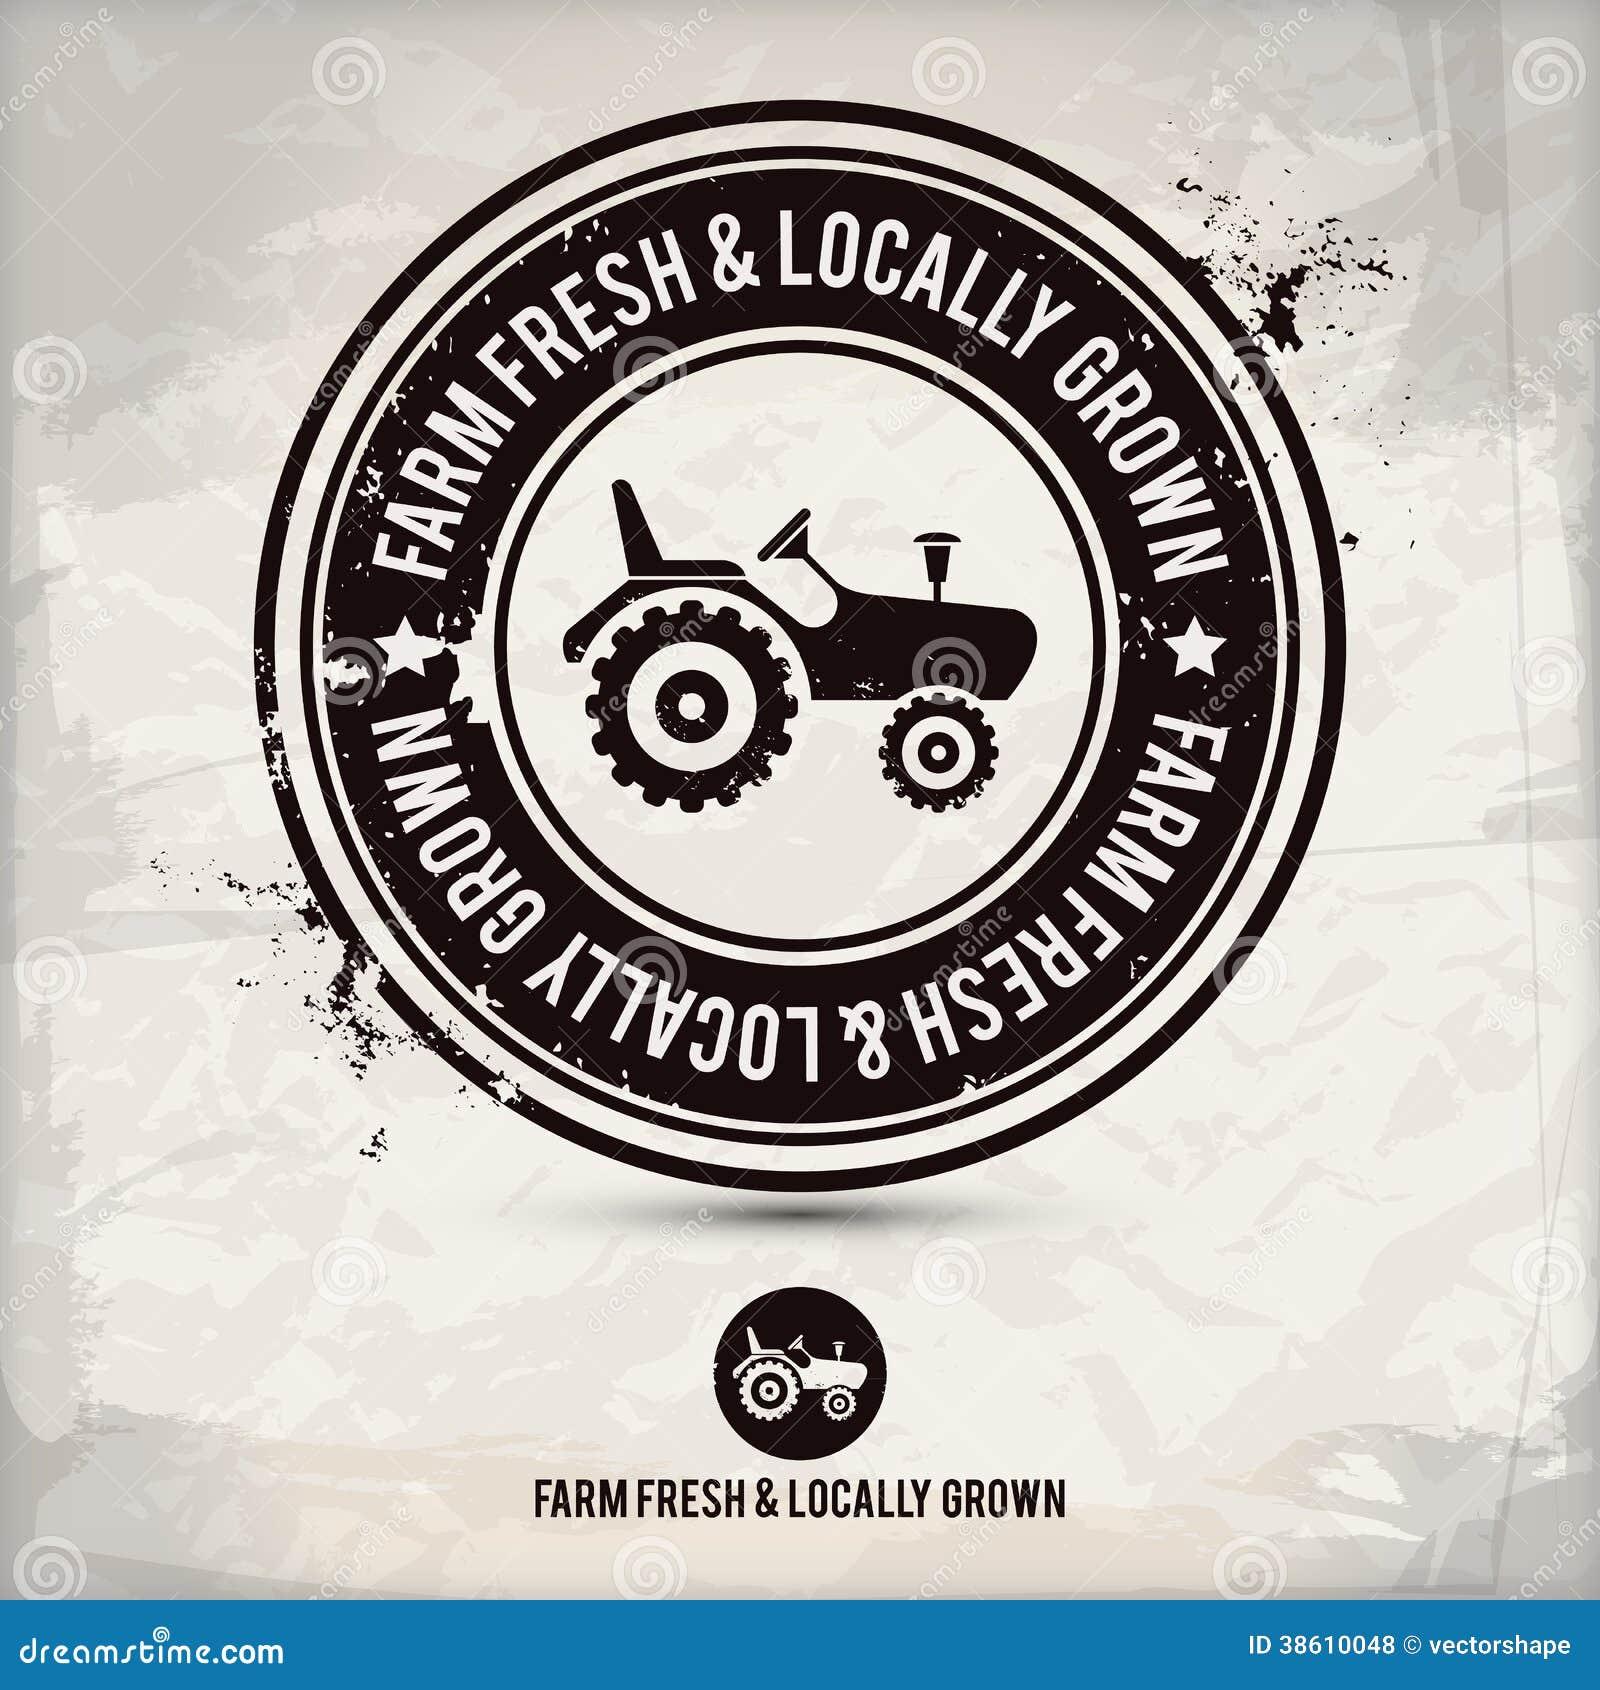 Alternative Farm Fresh & Locally Grown Stamp Stock Vector ...